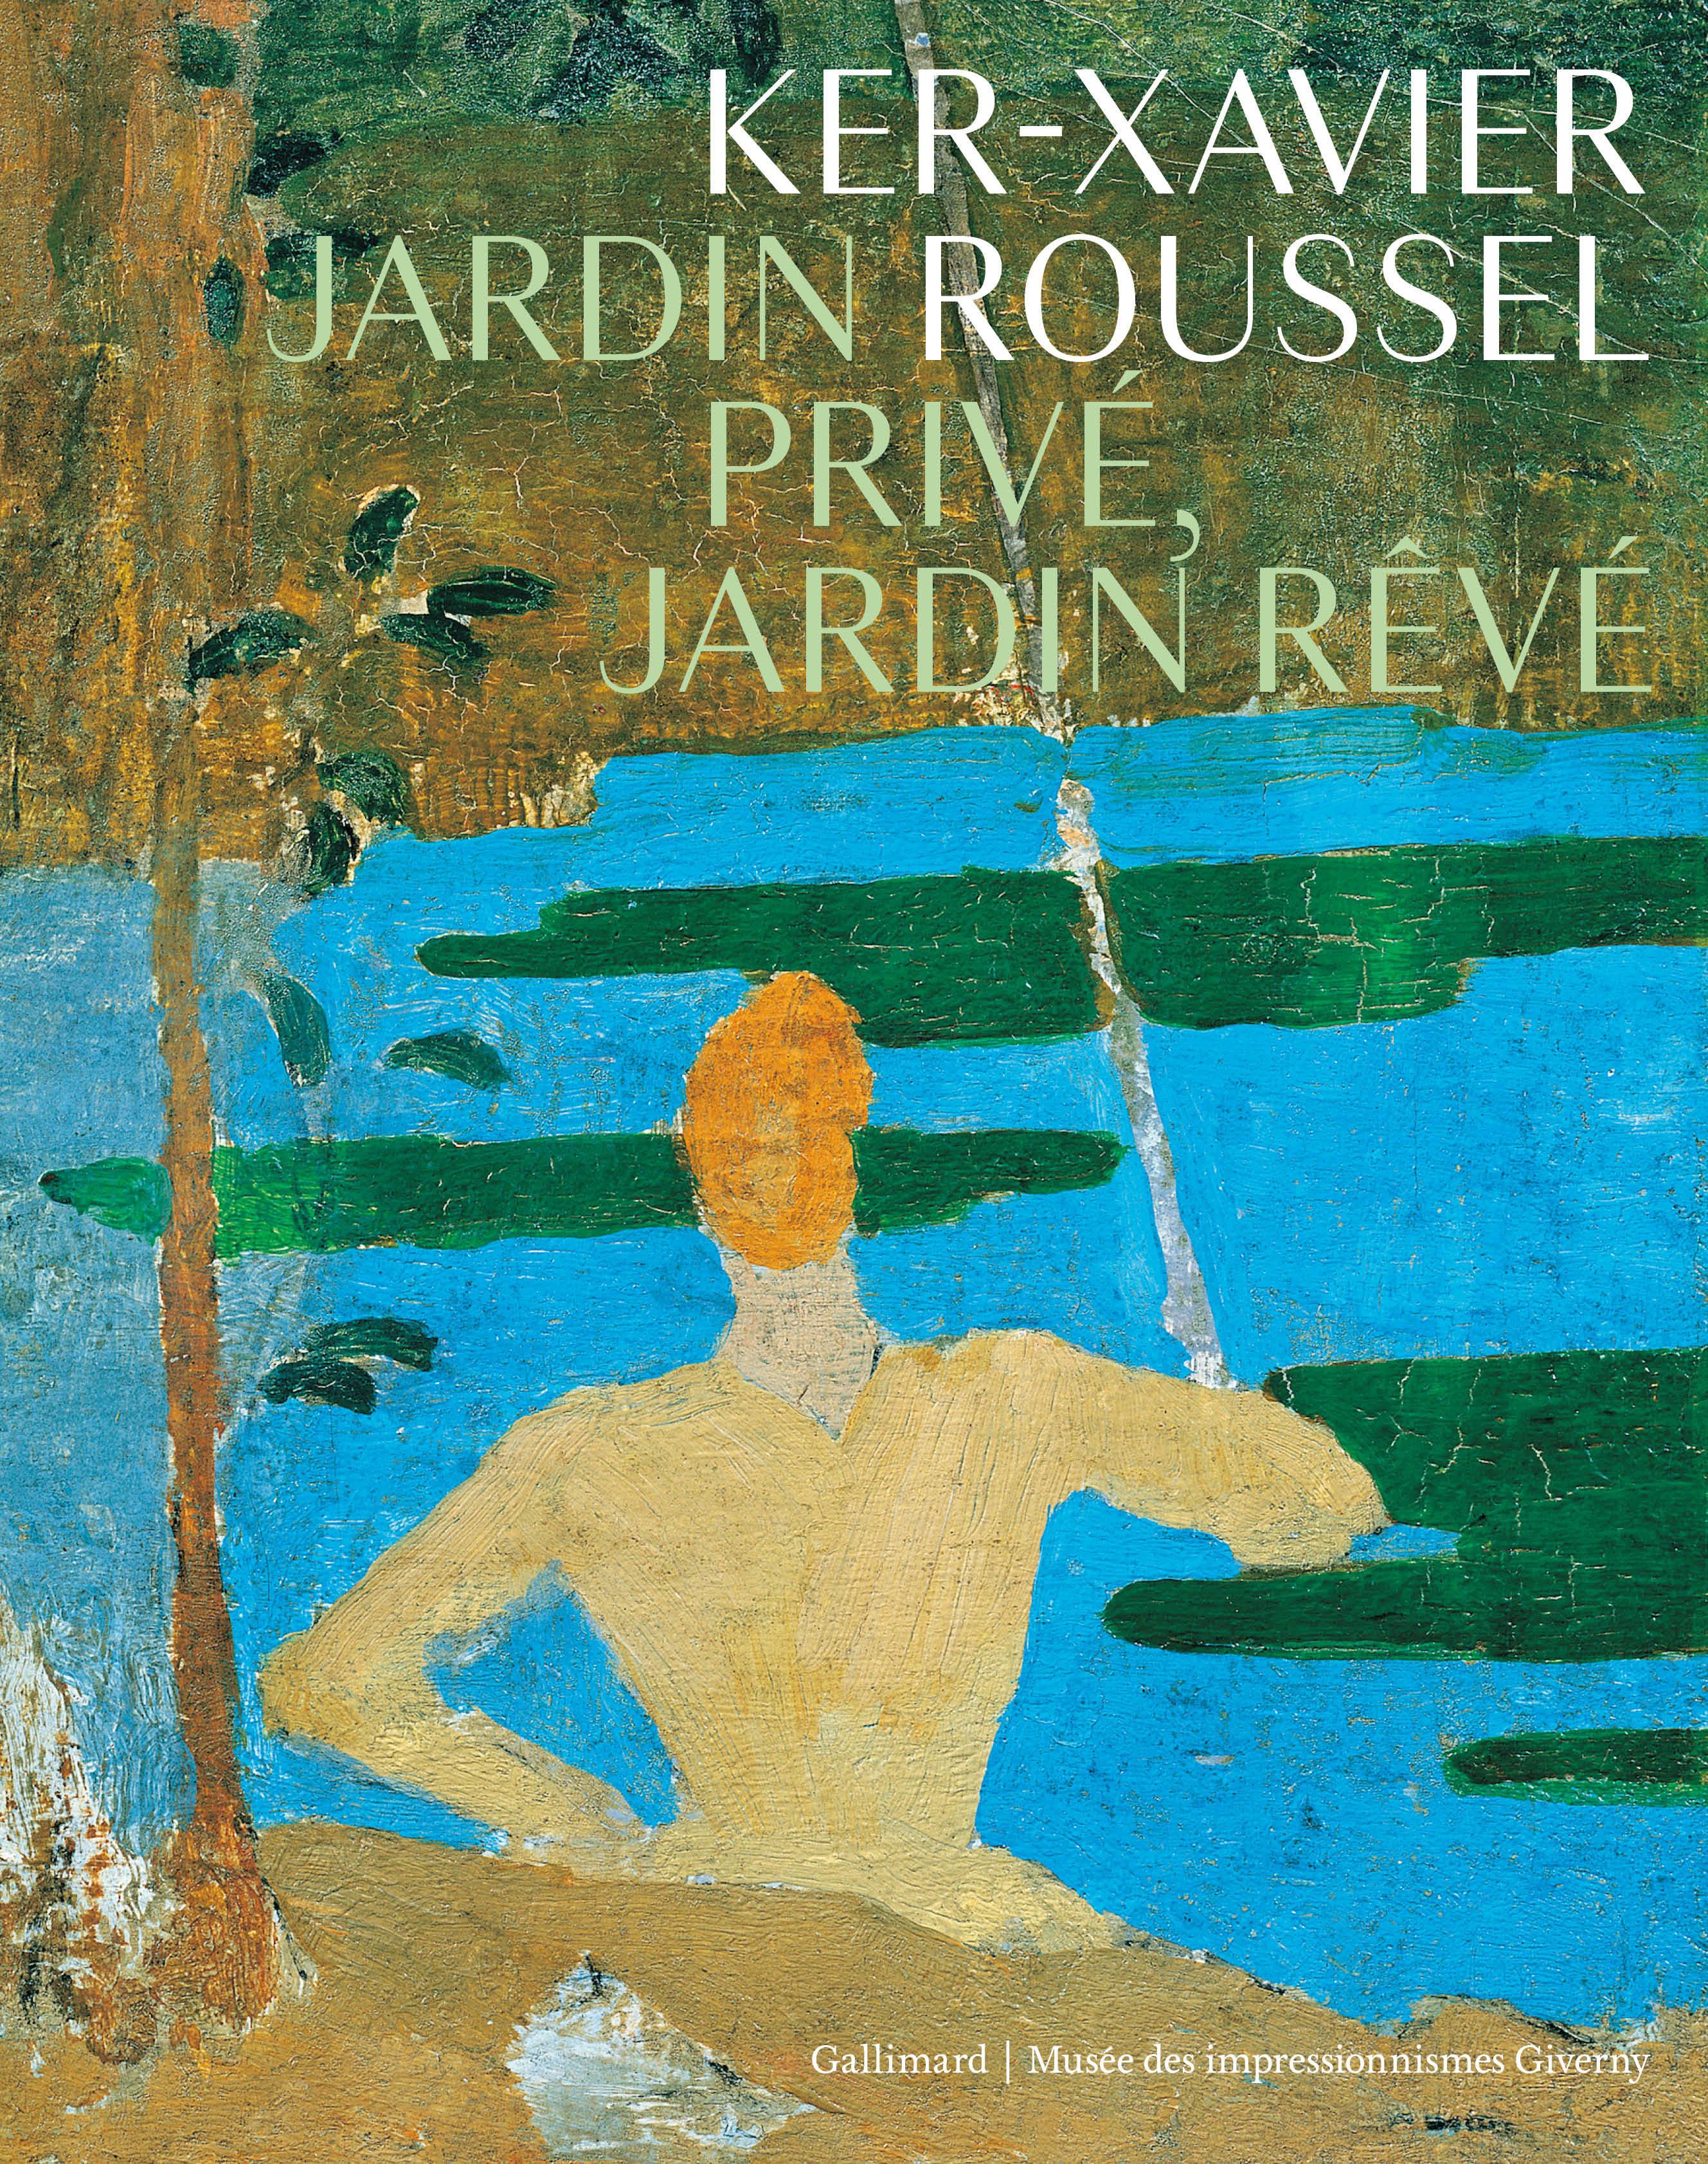 KER-XAVIER ROUSSEL - JARDIN PRIVE, JARDIN REVE